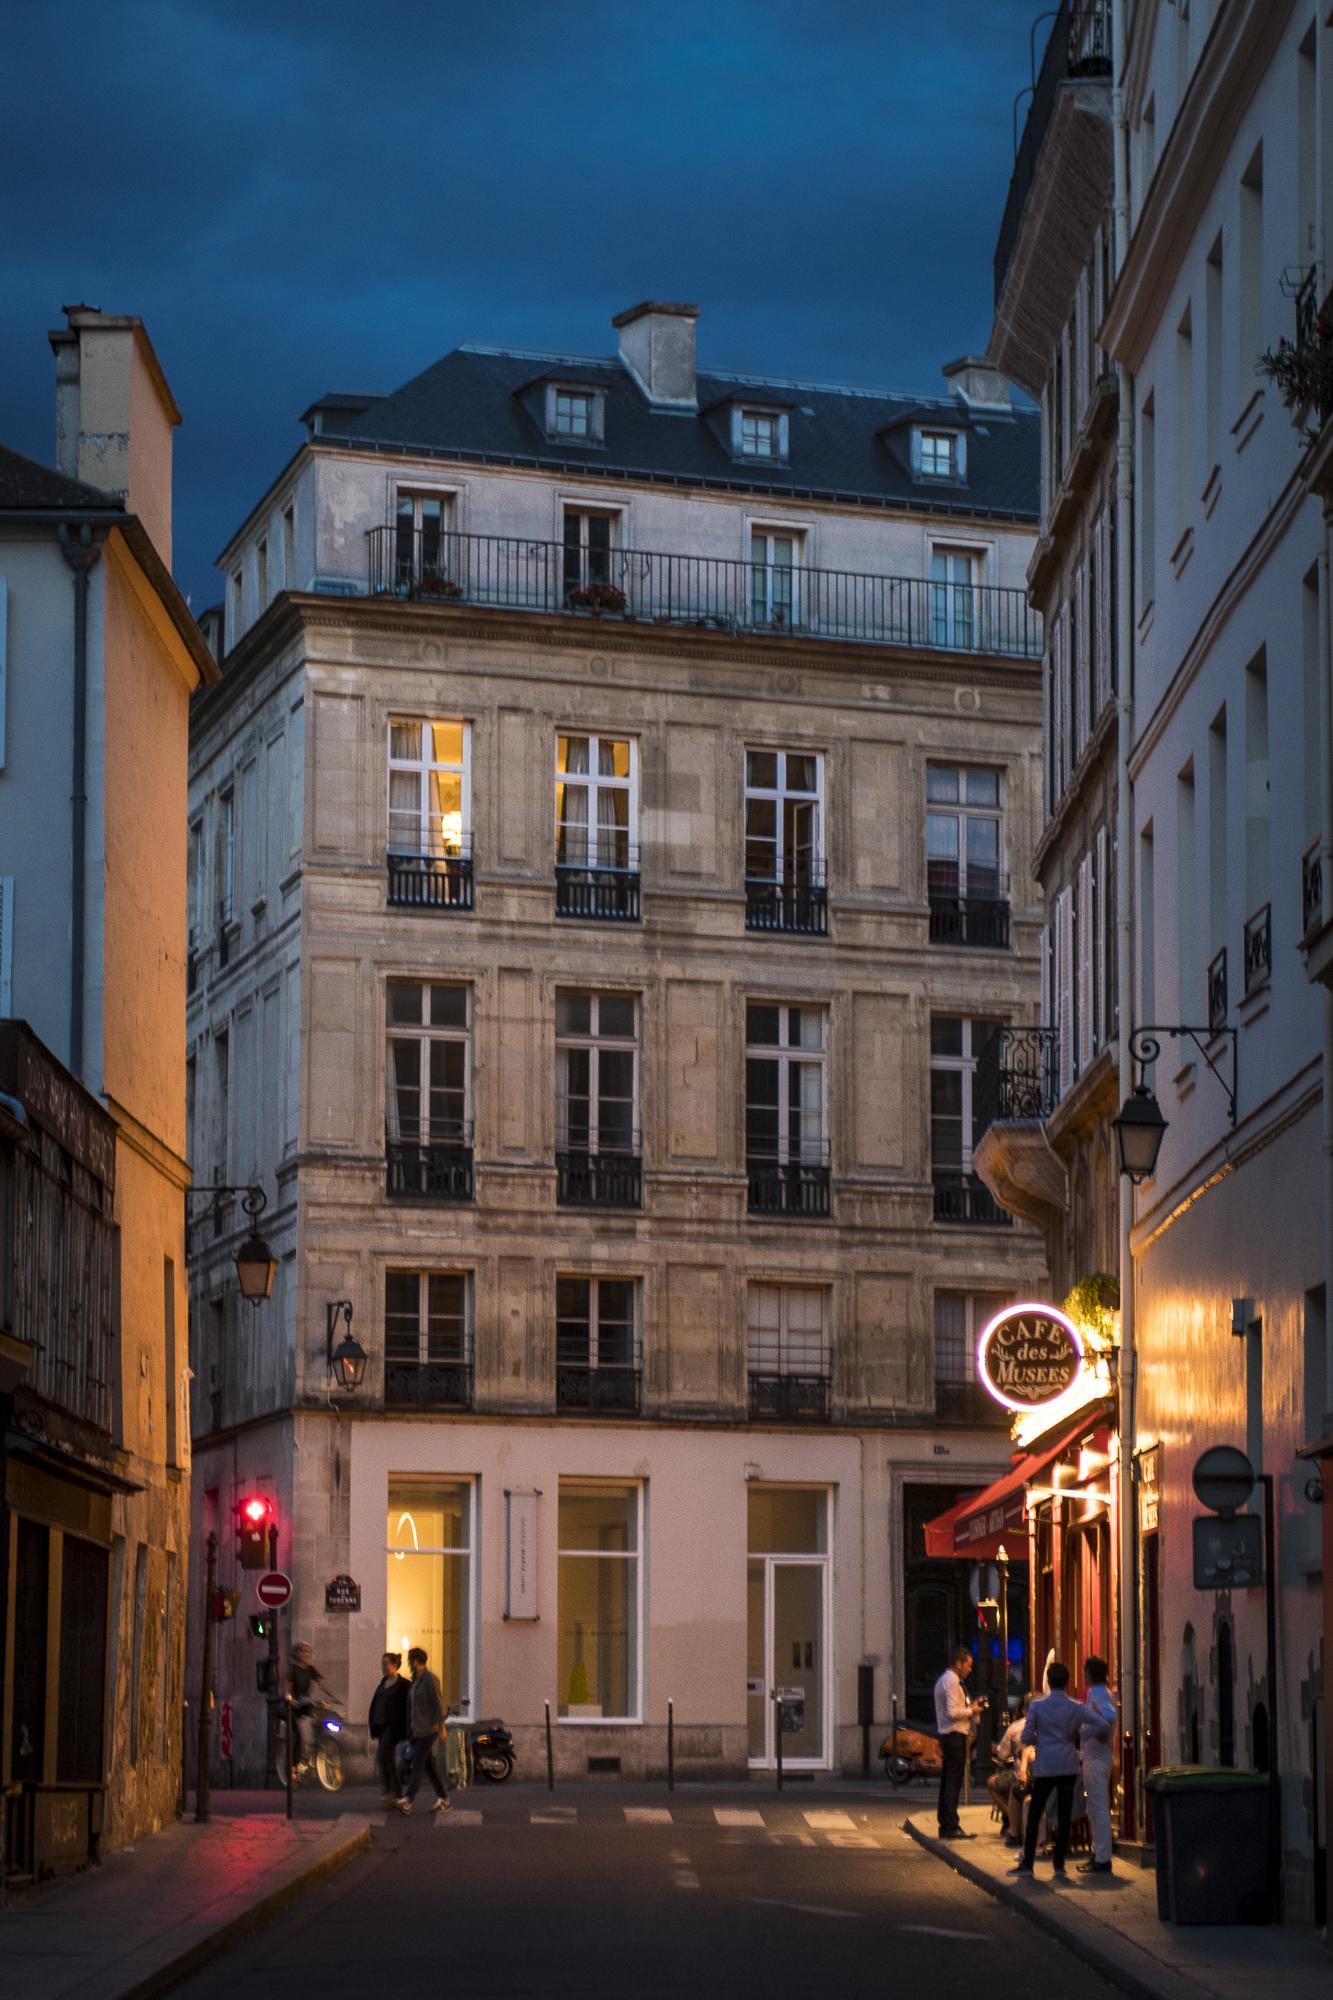 Marais - Paris  PHOTOGRAPHY: ALEXANDER J.E. BRADLEY • NIKON D500 • AF-S NIKKOR 24-70 ƒ/2.8G ED @ 56MM • ƒ/2.8 • 1/25 • ISO 500